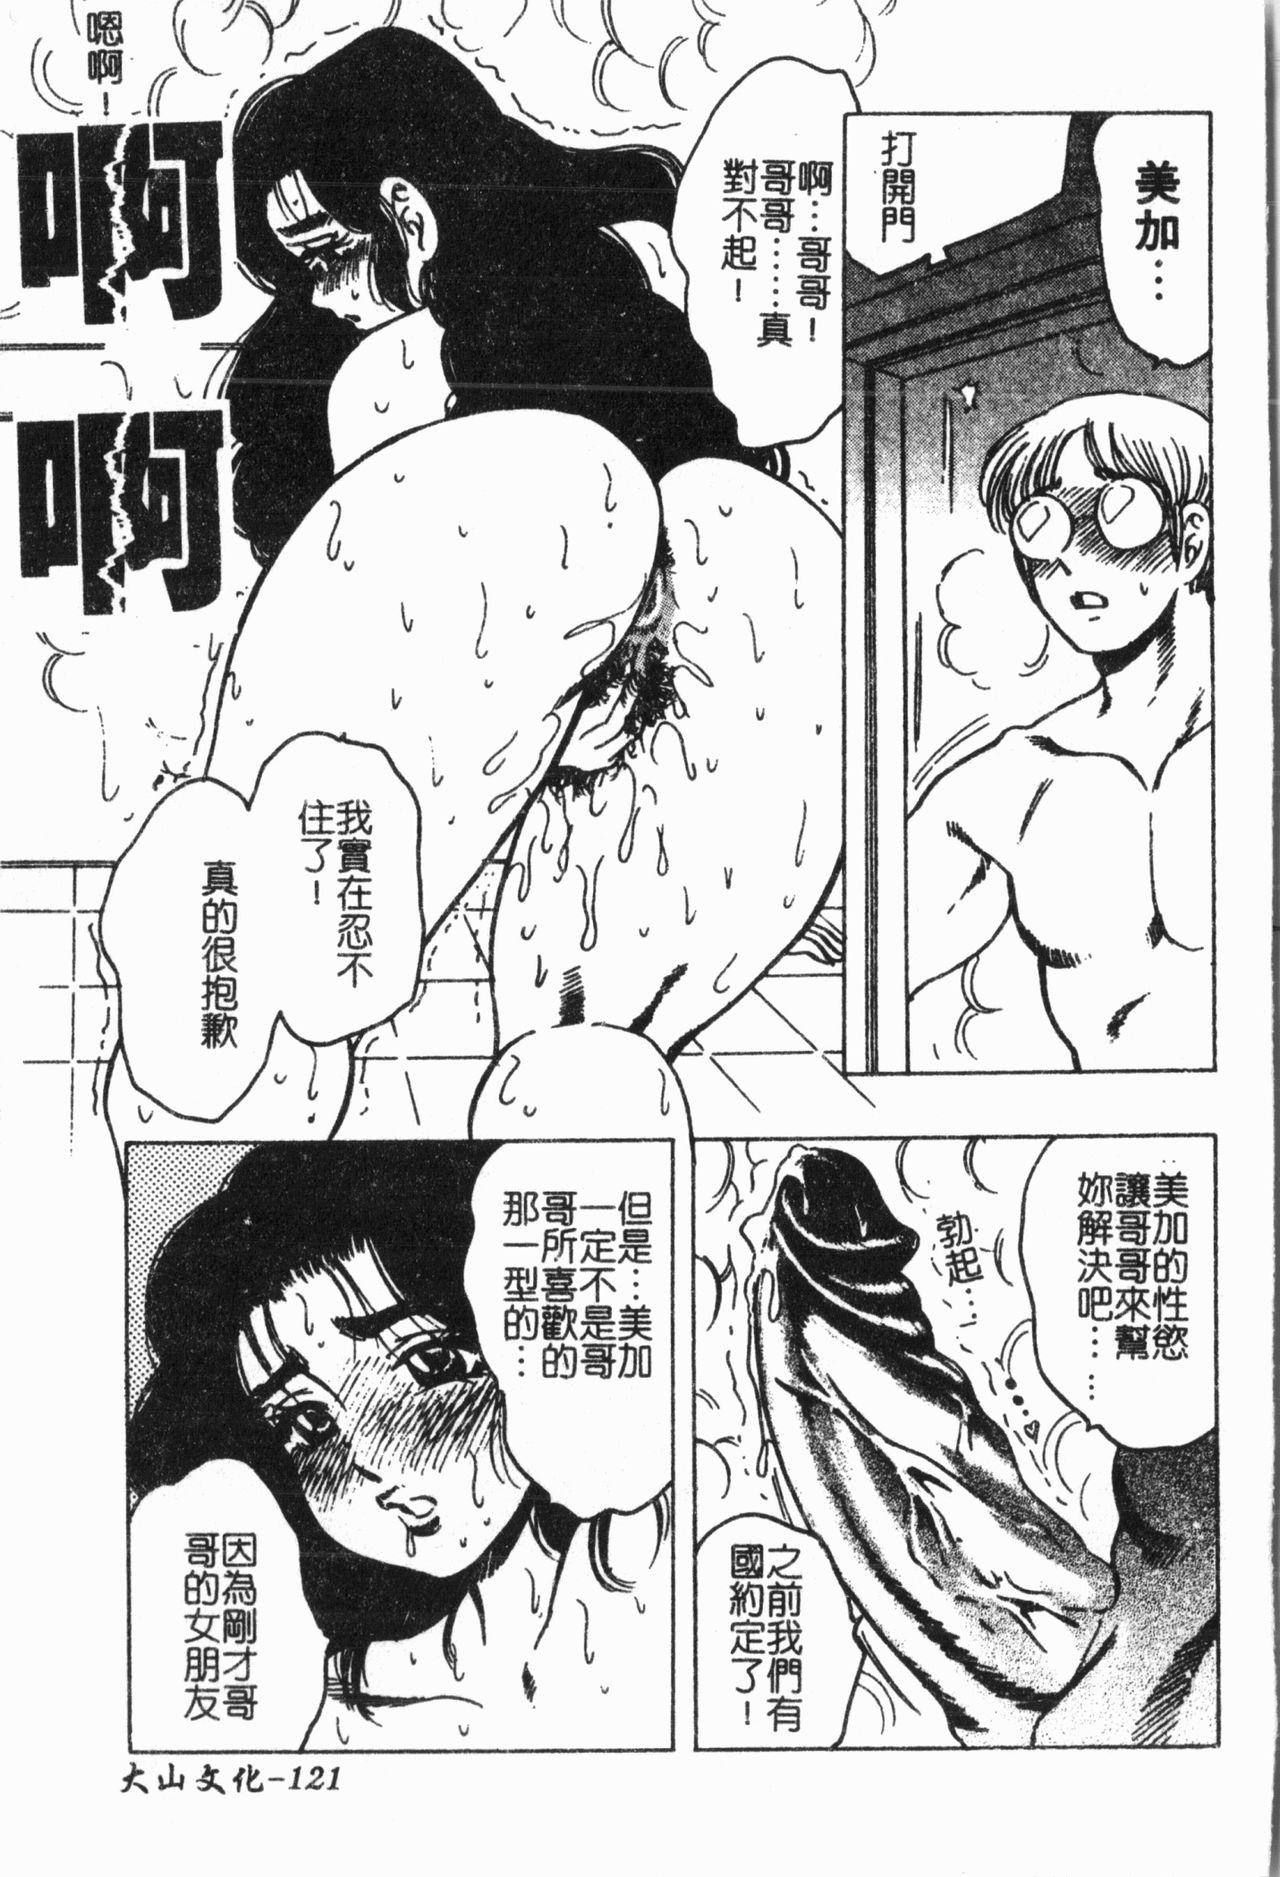 Imouto Koishi 6 123